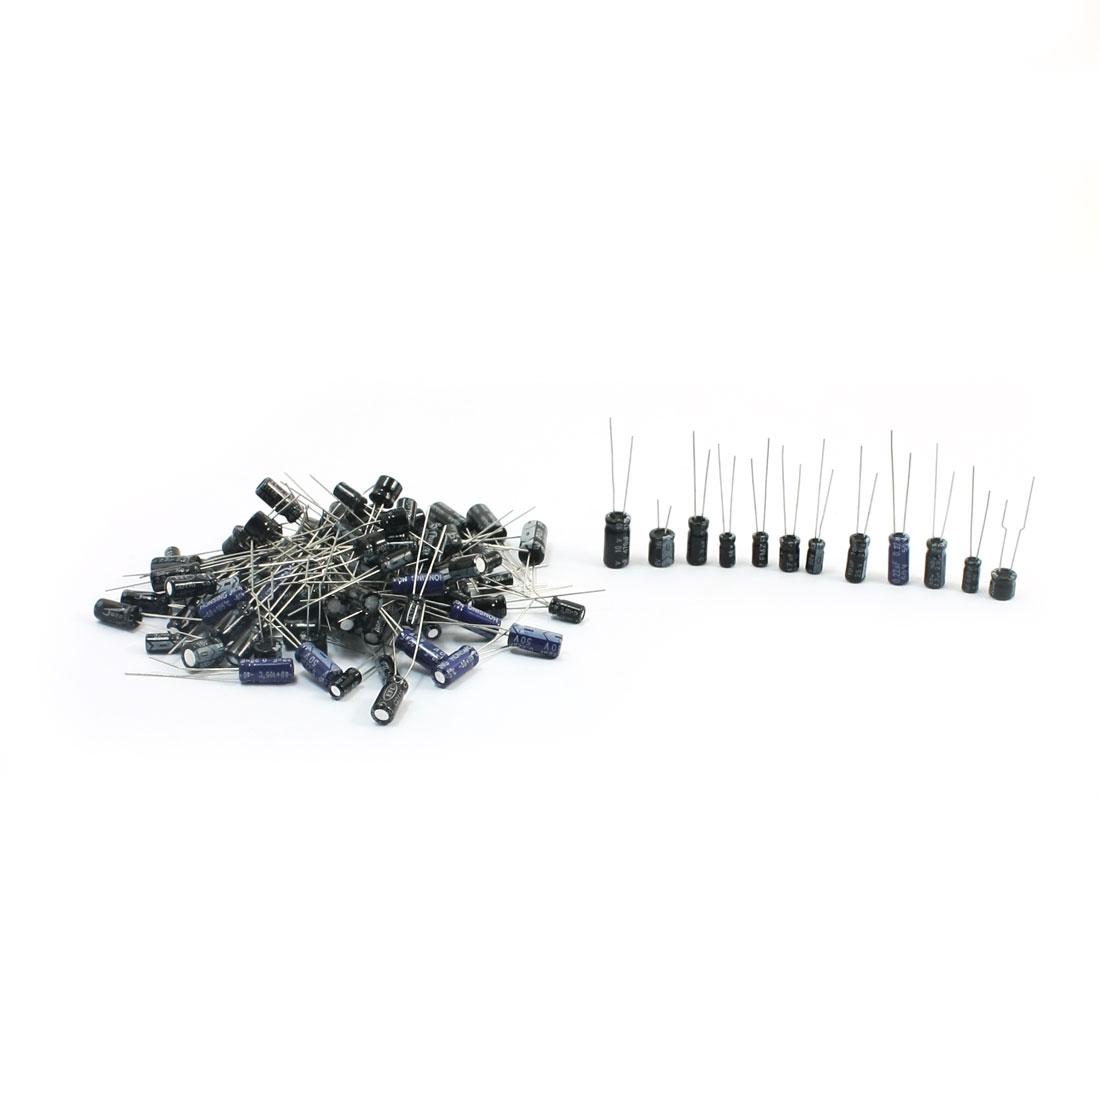 120Pcs 12 Values 0.22uF-470uF Radial Lead DIP Electrolytic Capacitors